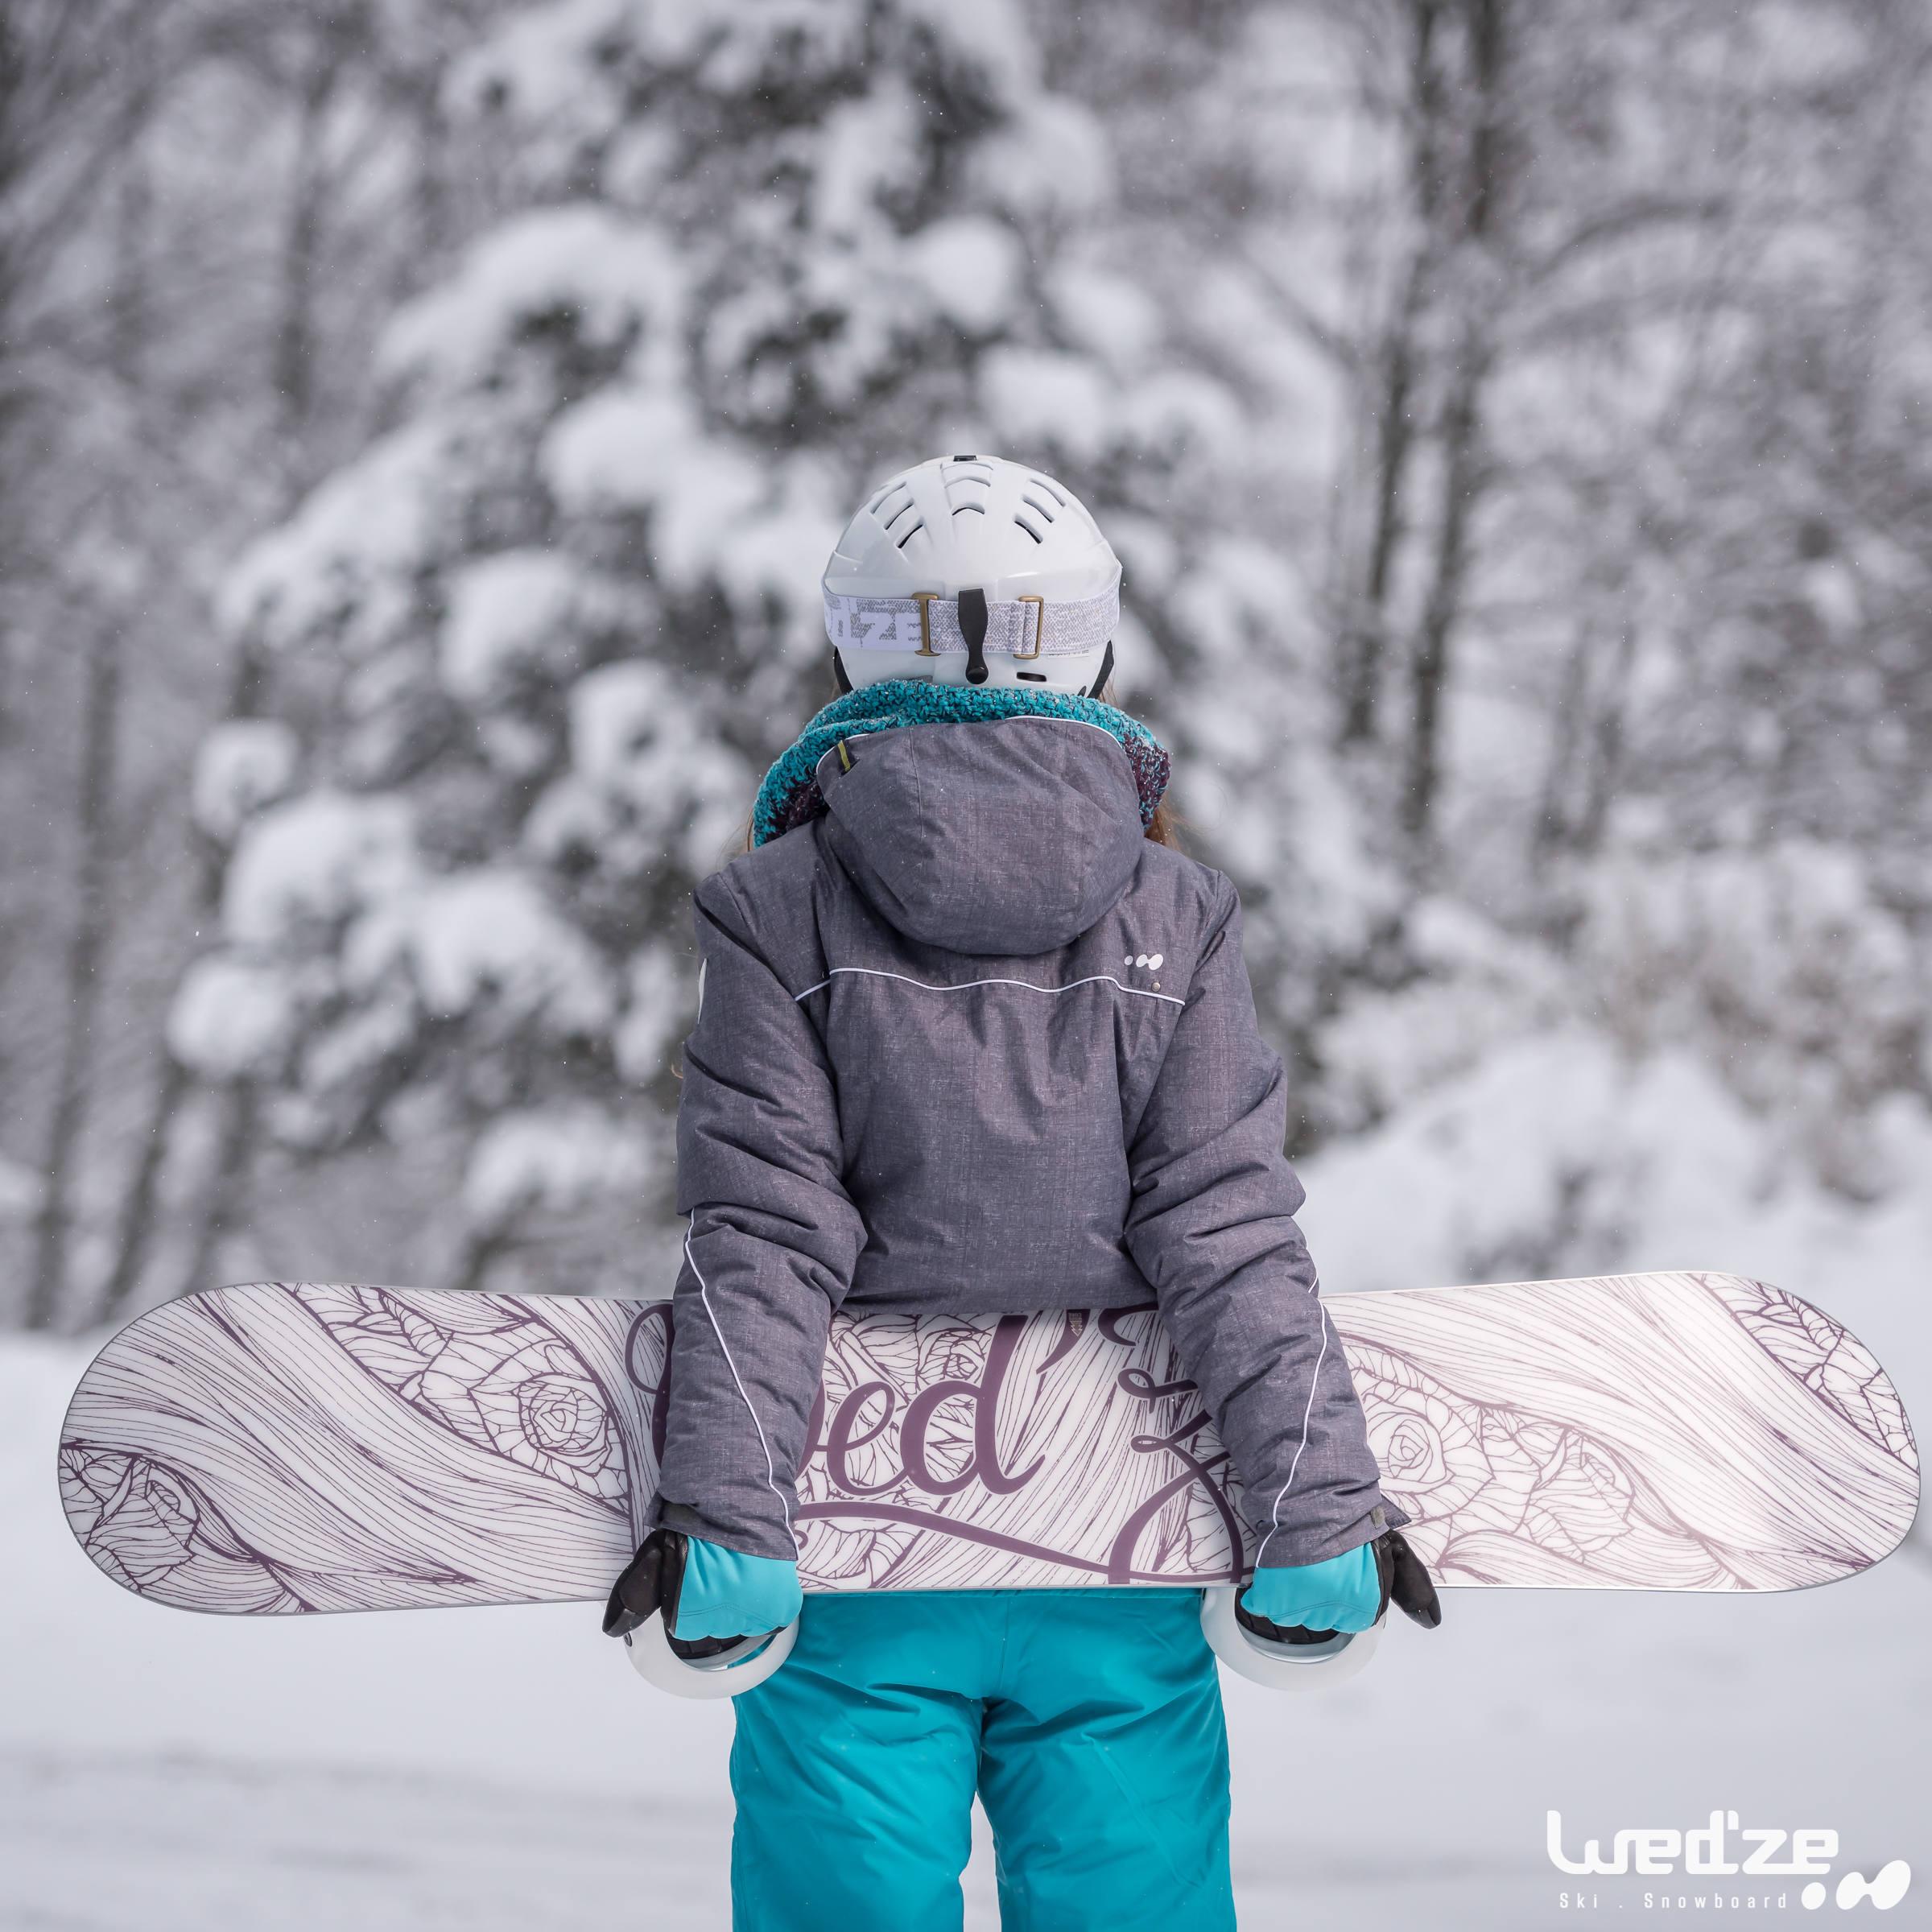 snowboard tahtasi.jpg